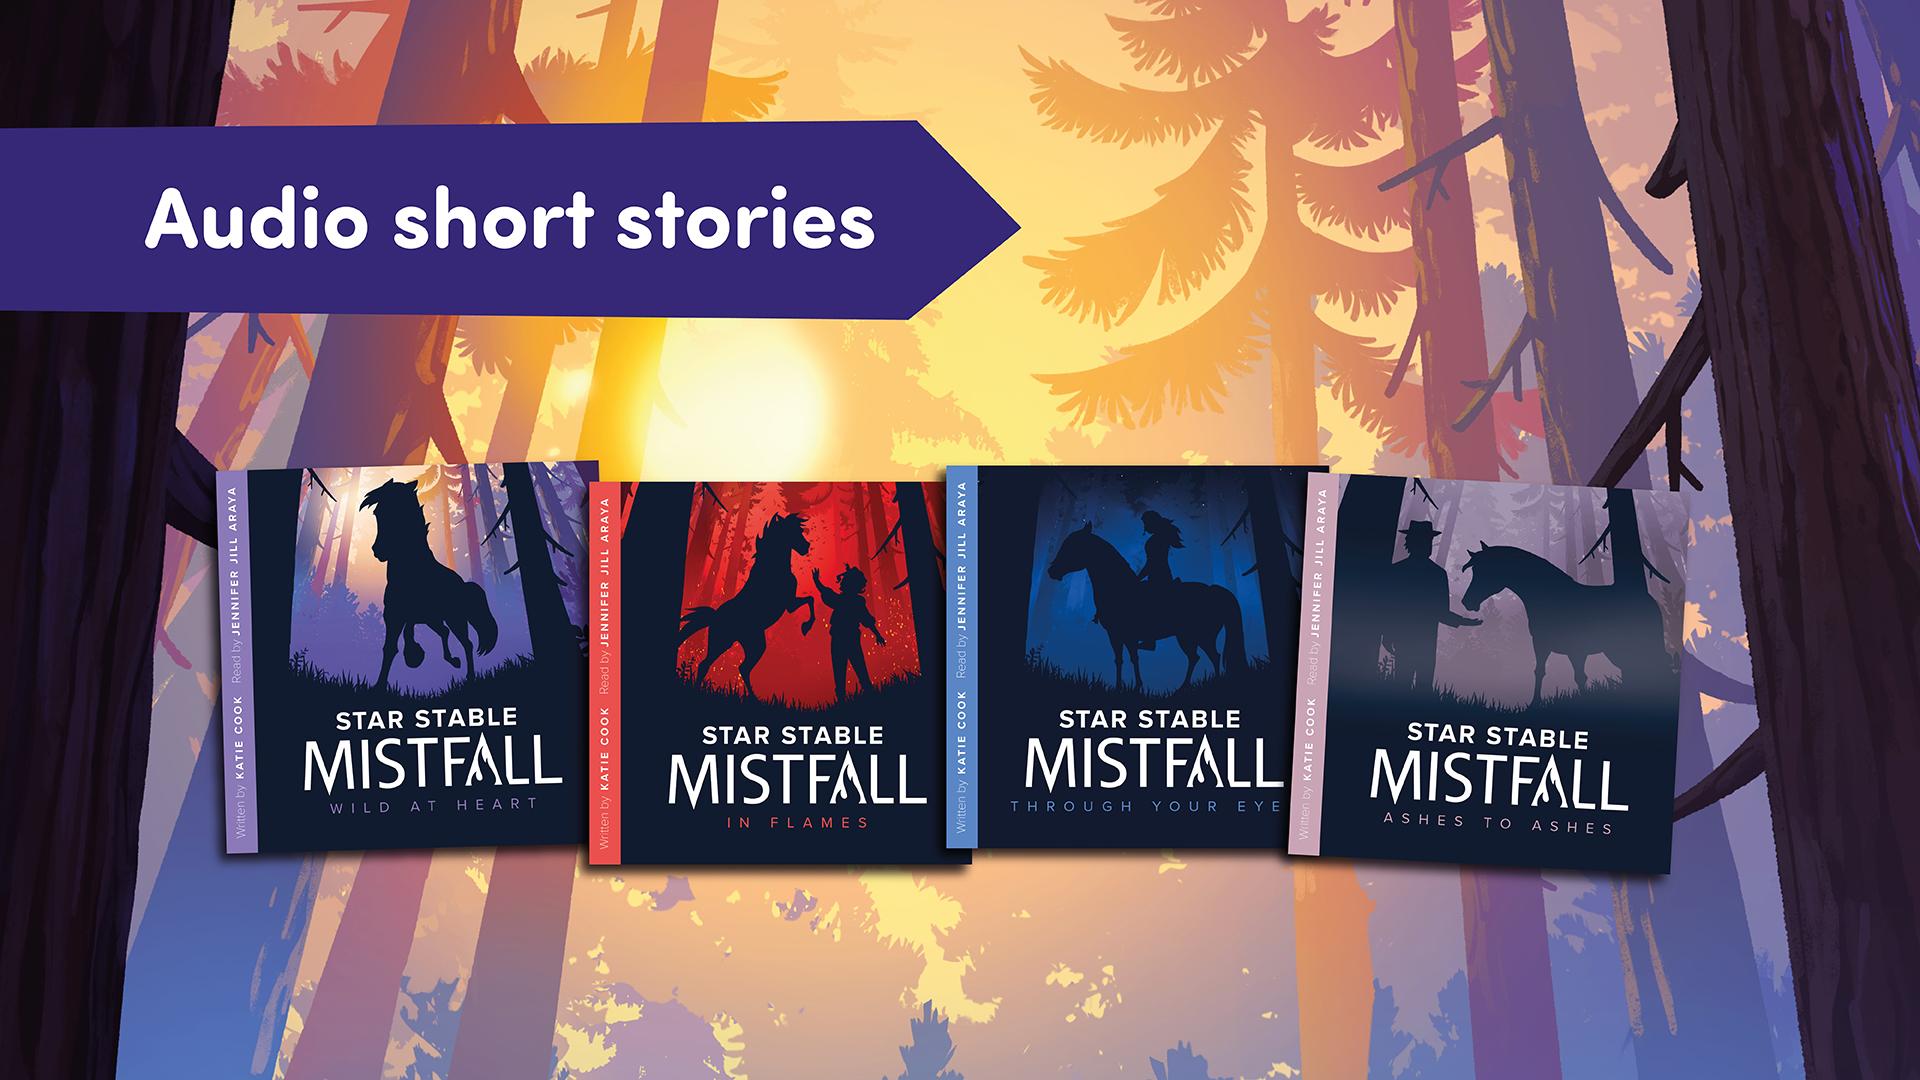 Star Stable: Mistfall audio short stories